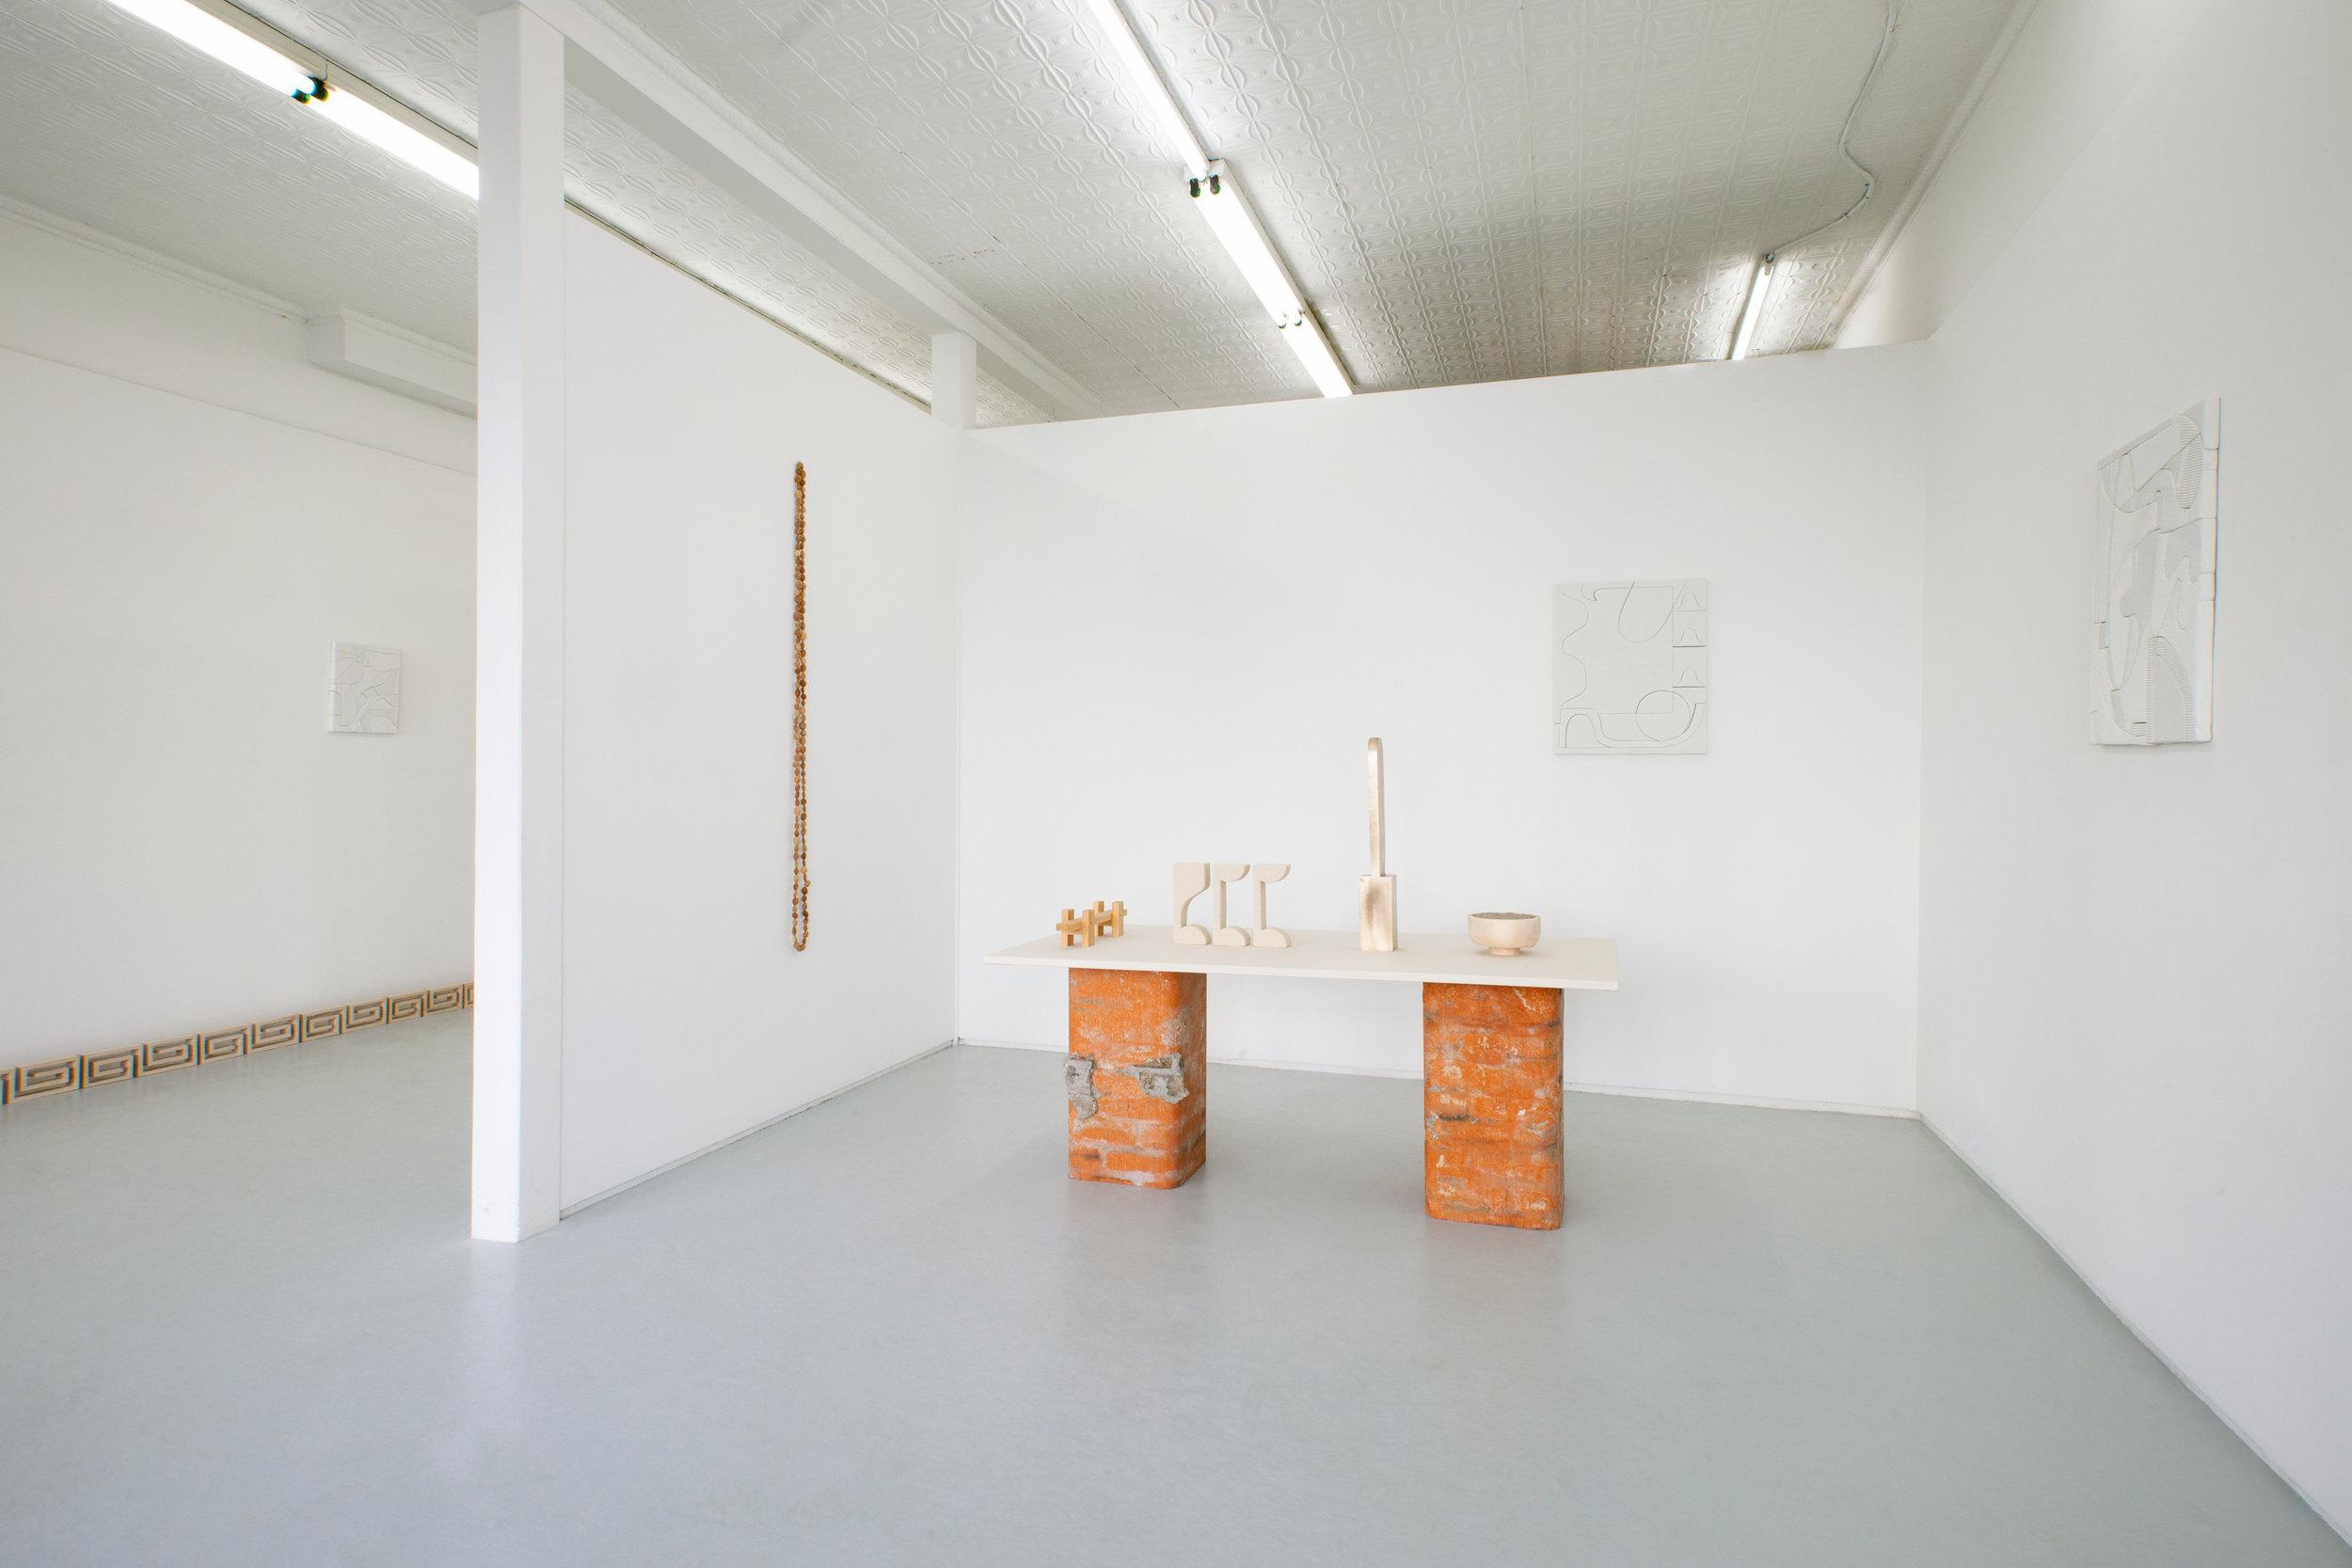 Elizabeth_Atterbury-Night_Comes_In-Installation_View_005.jpg